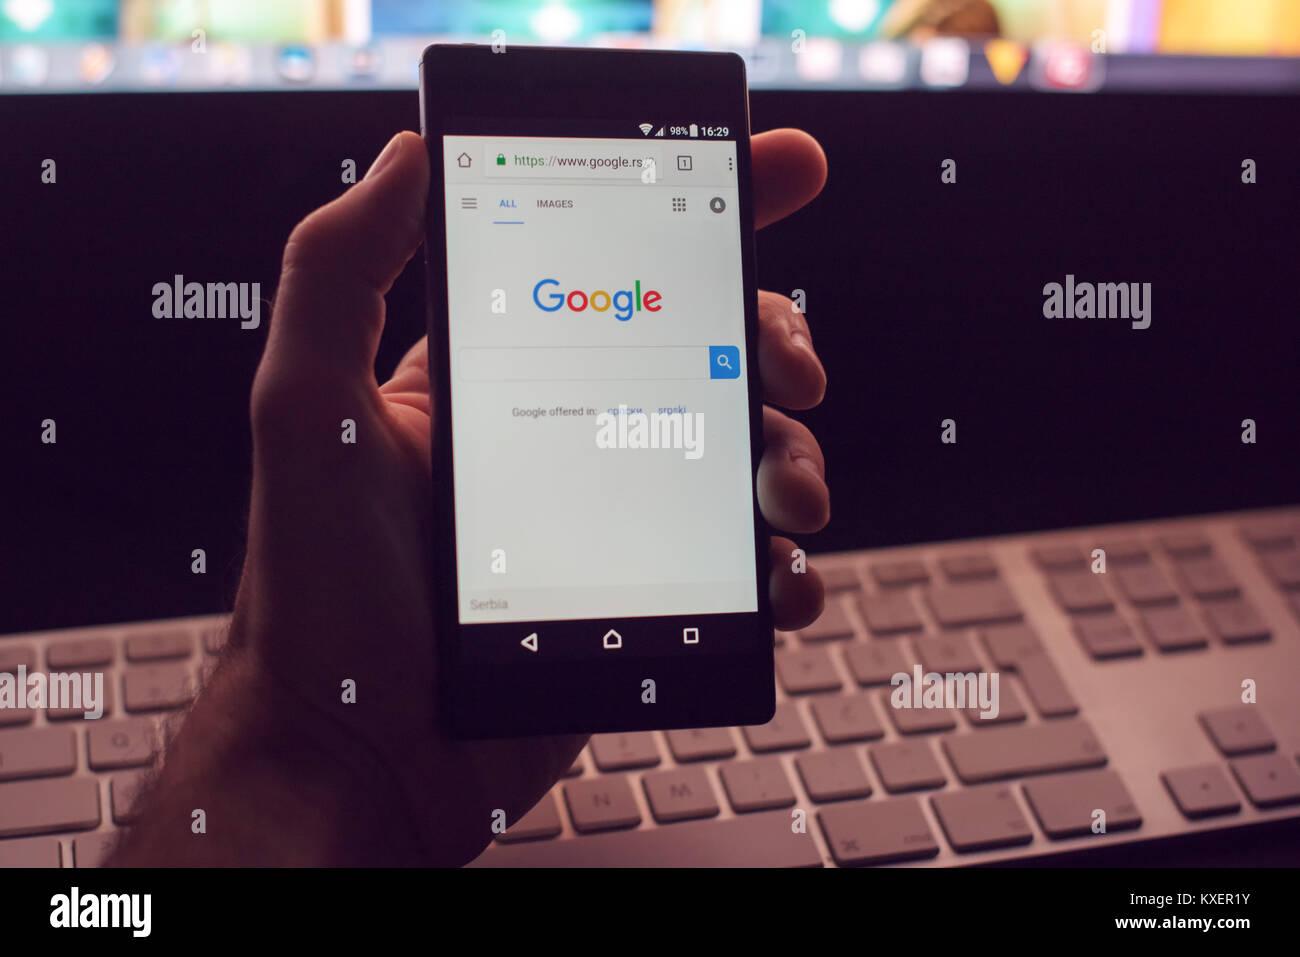 NOVI SAD, SERBIA - JANUARY 05, 2018: Google web page on Sony Xperia Z5 smartphone device, illustrative editorial - Stock Image